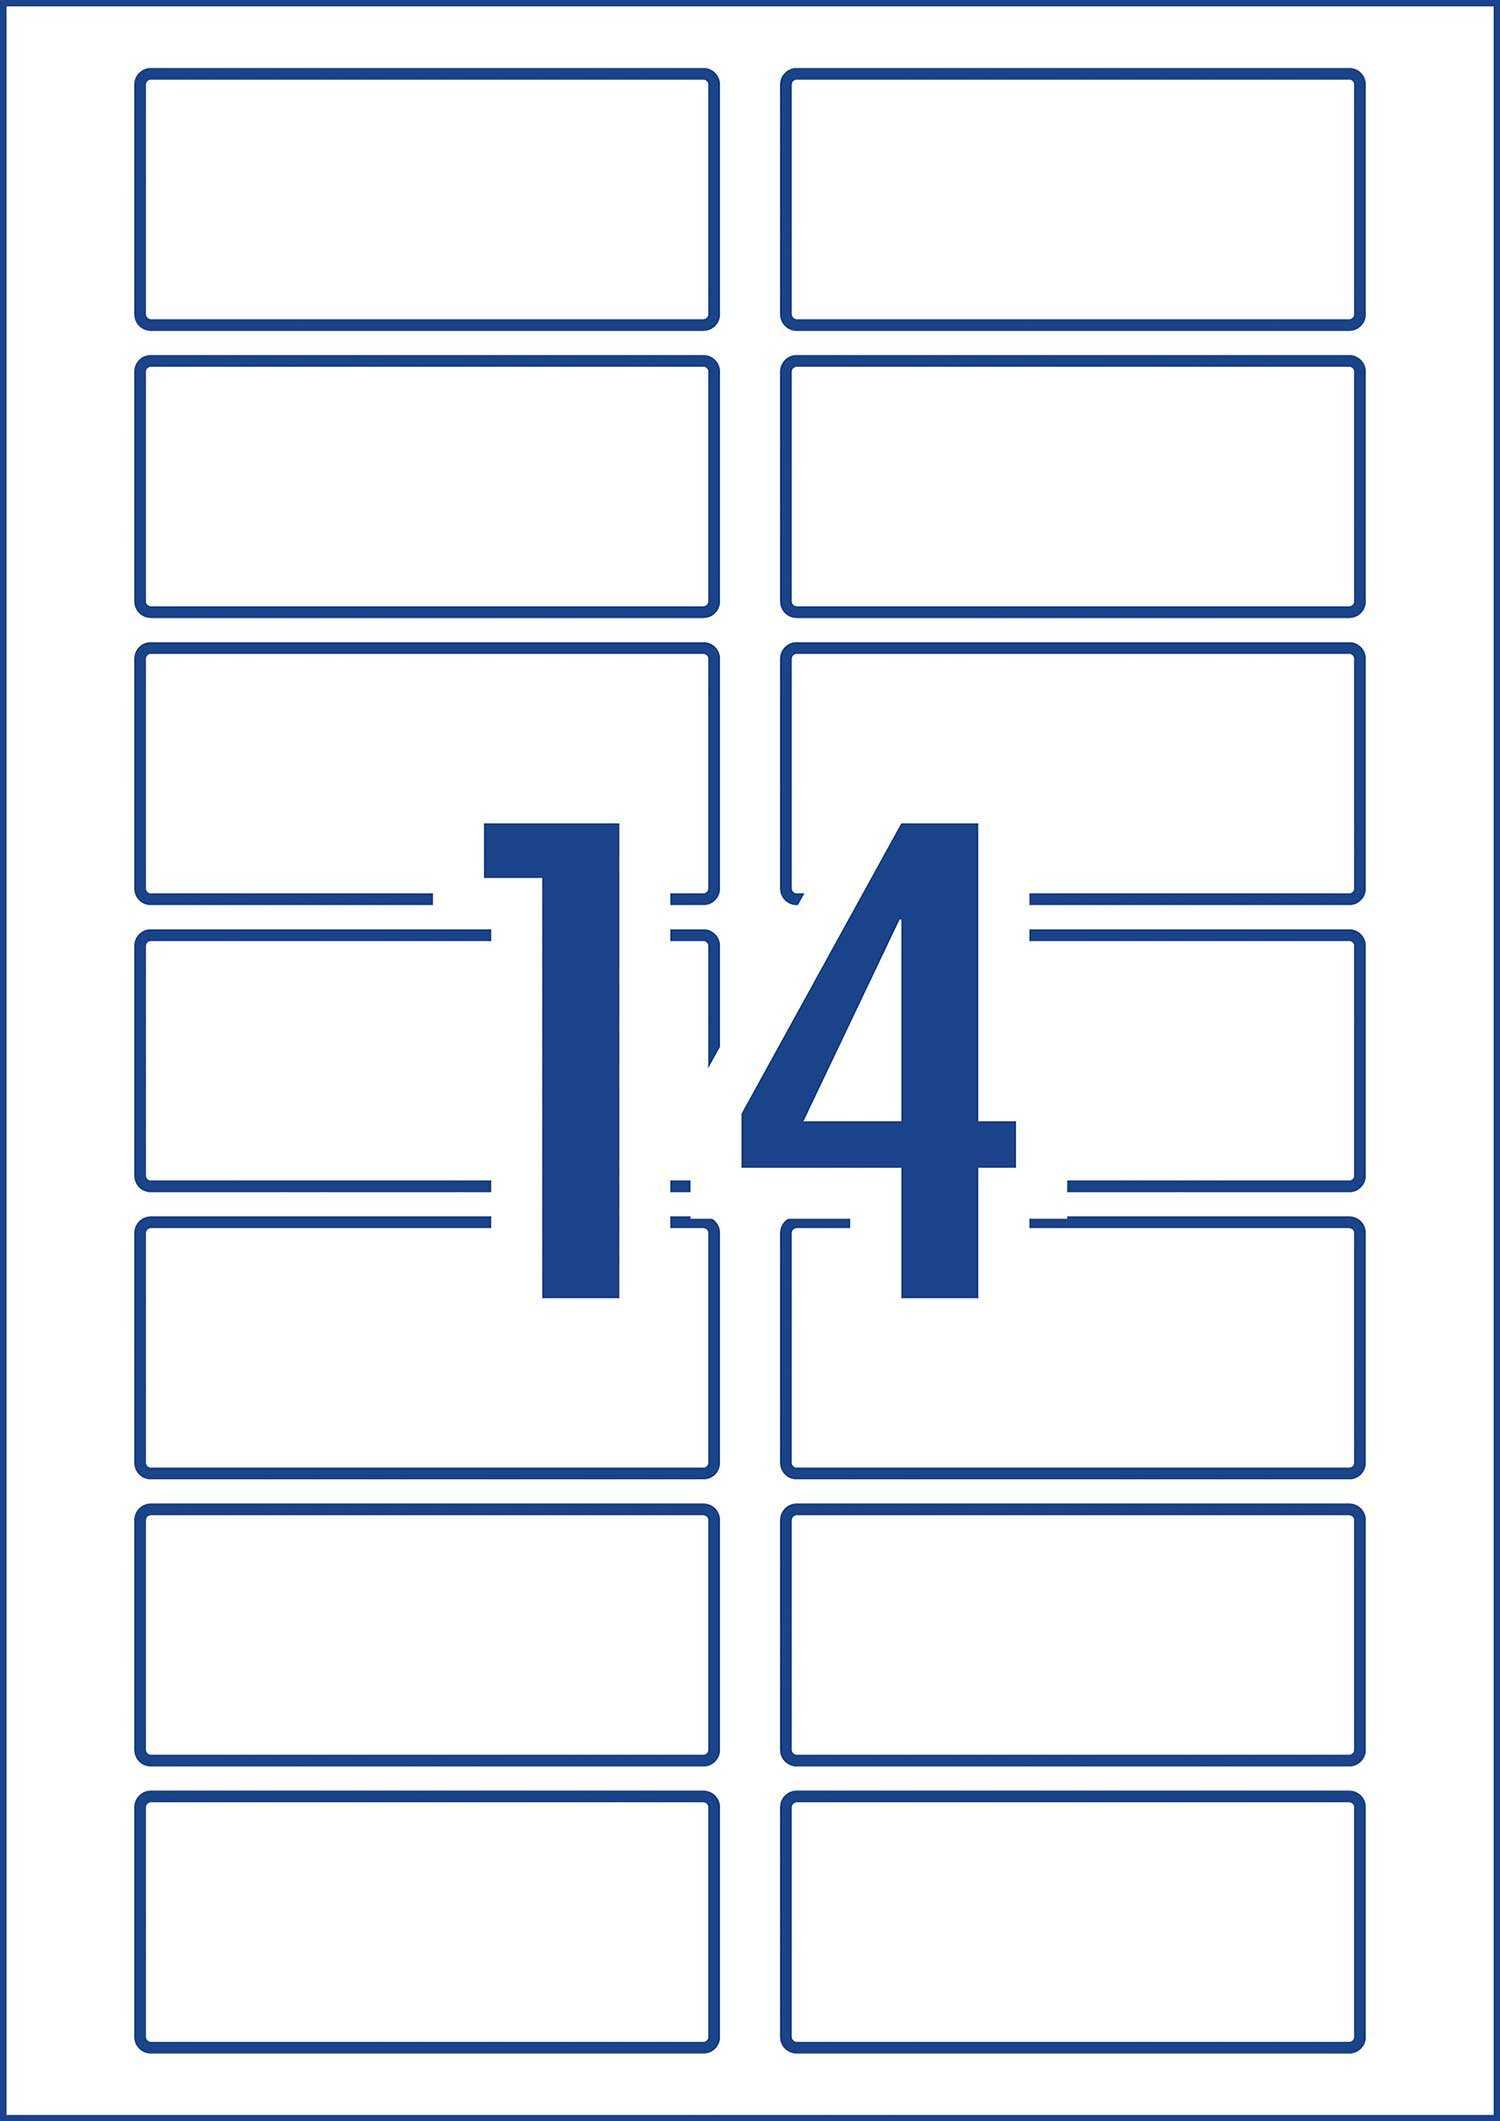 Word Label Template 8 Per Sheet A4 – Prahu Intended For Word Label Template 8 Per Sheet